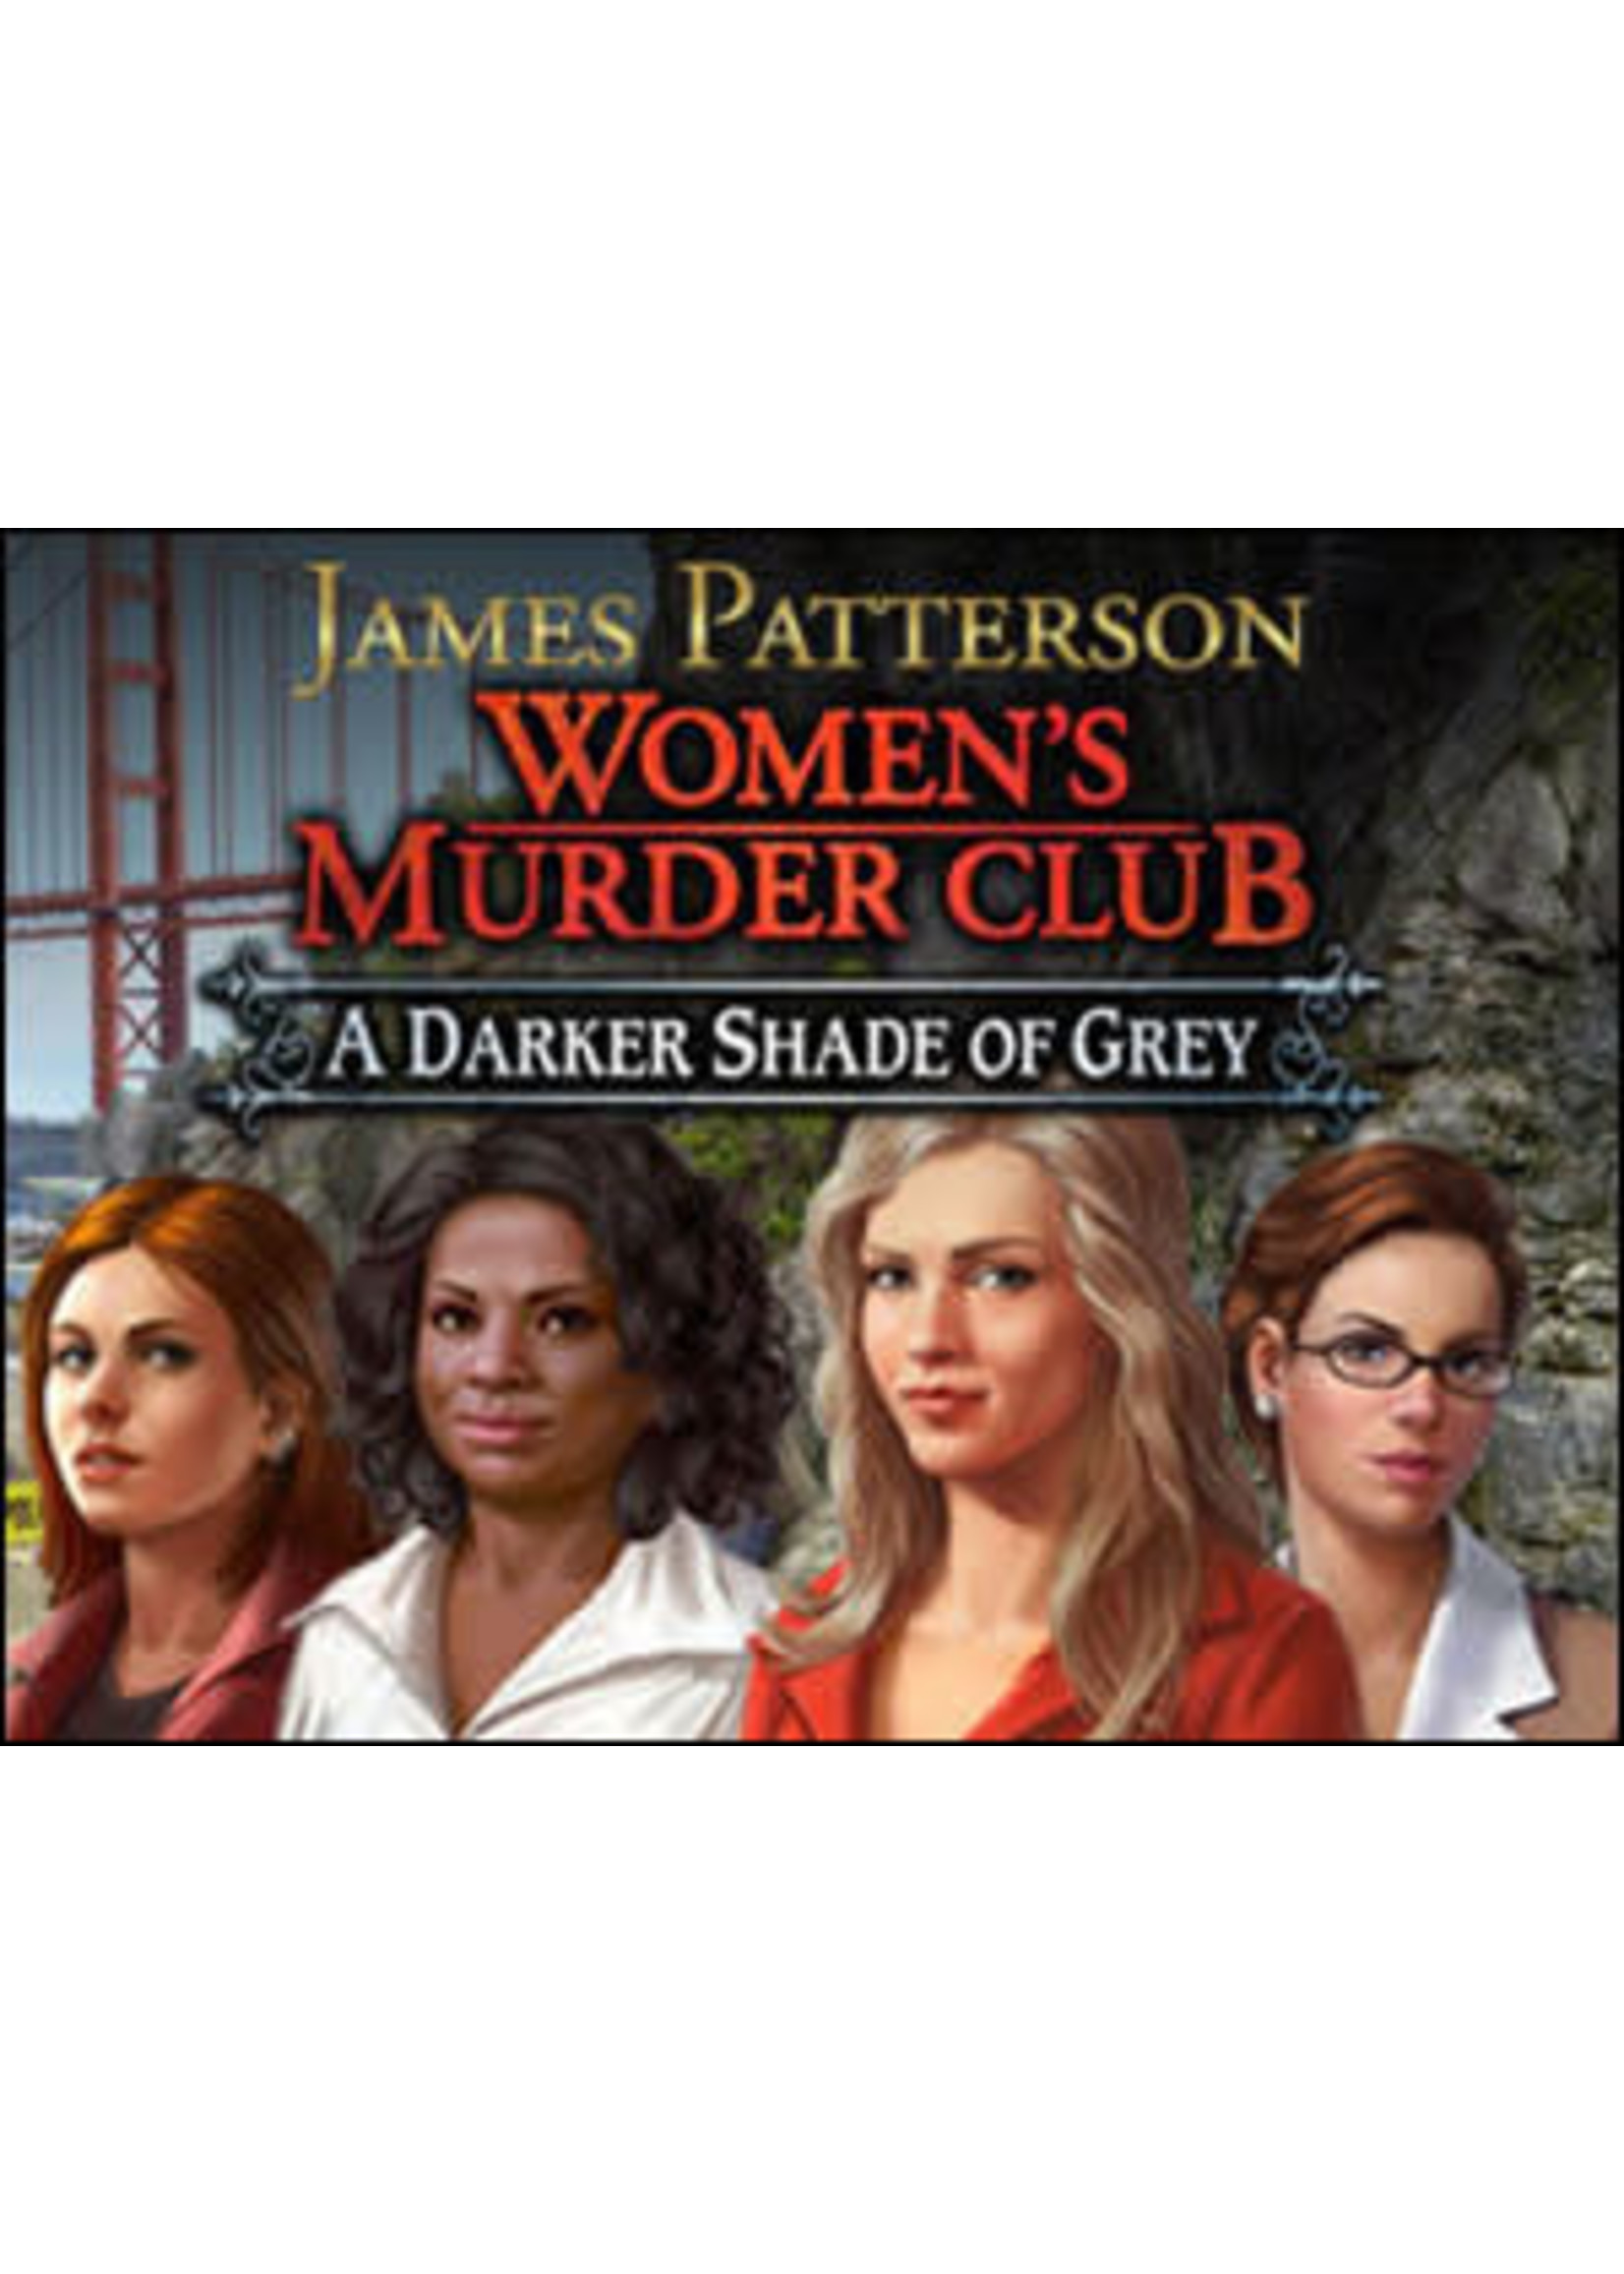 James Patterson Women's Murder Club A Darker Shade Of Grey PC Games